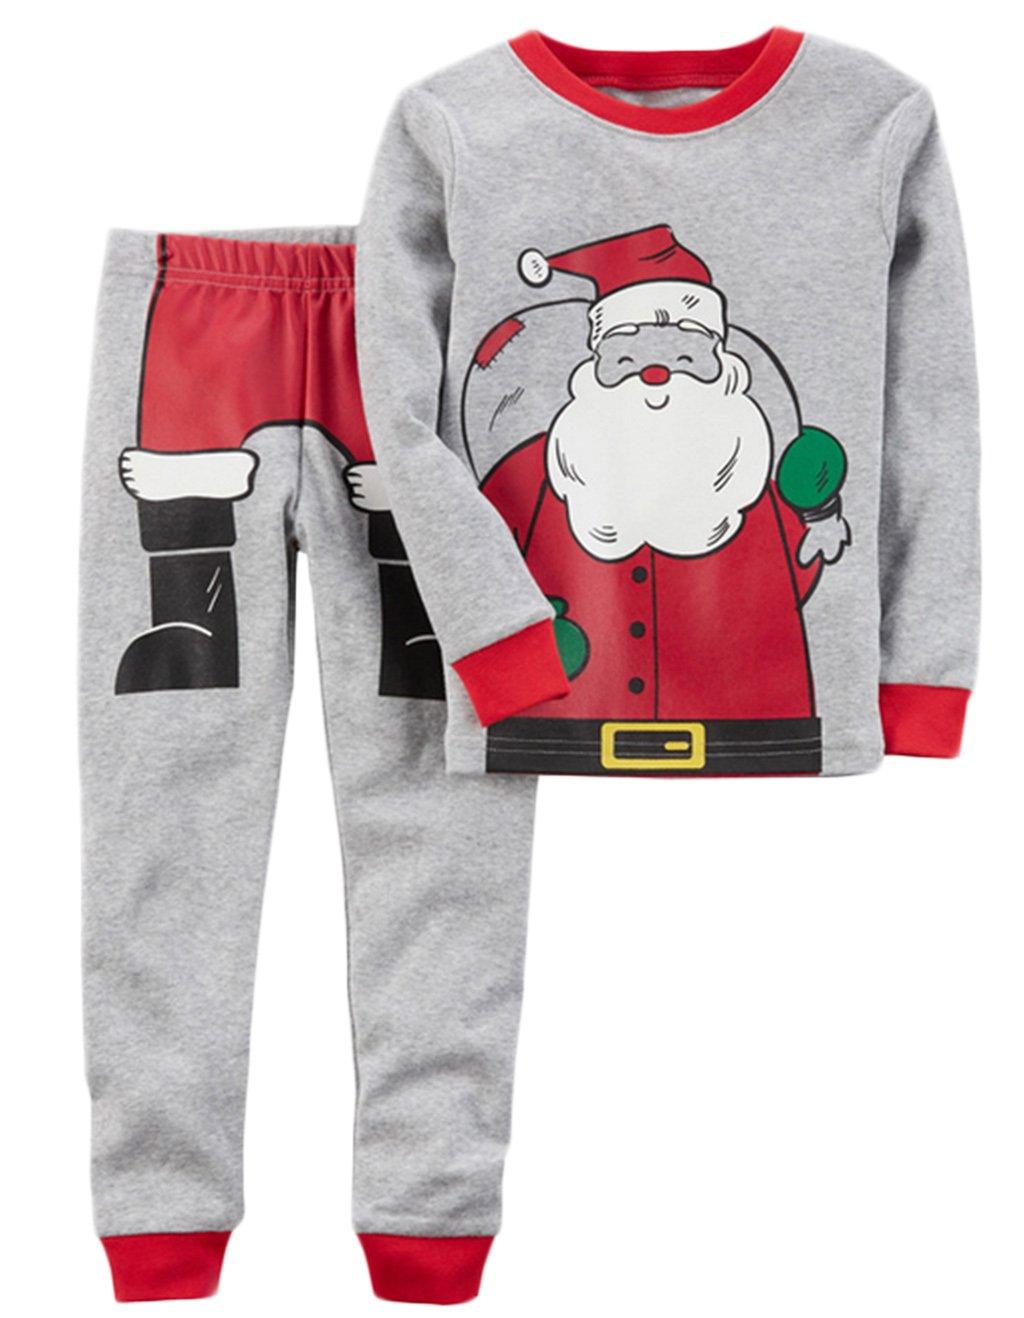 Kids Baby Boys Girls Christmas Santa Claus Print Tops T -shirt Pants Pajamas Set BANGELY